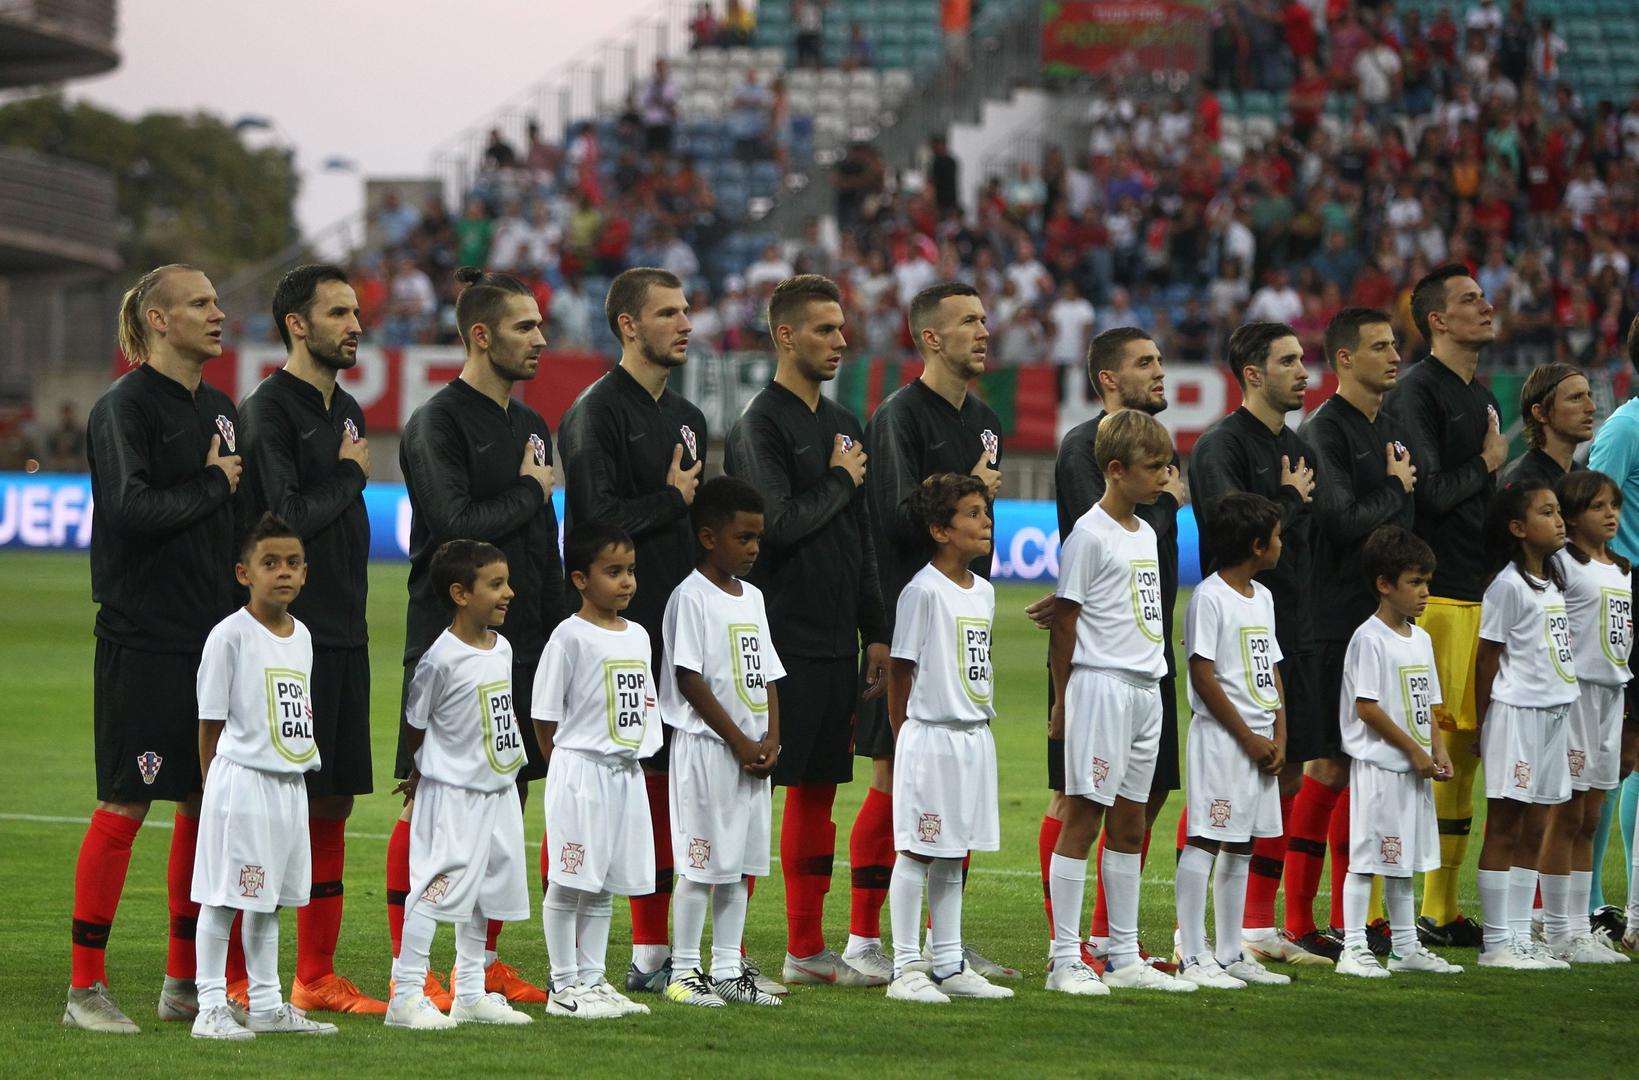 Hrvatska remizirala u Faru, vatreni prvi put Portugalcima zabili gol